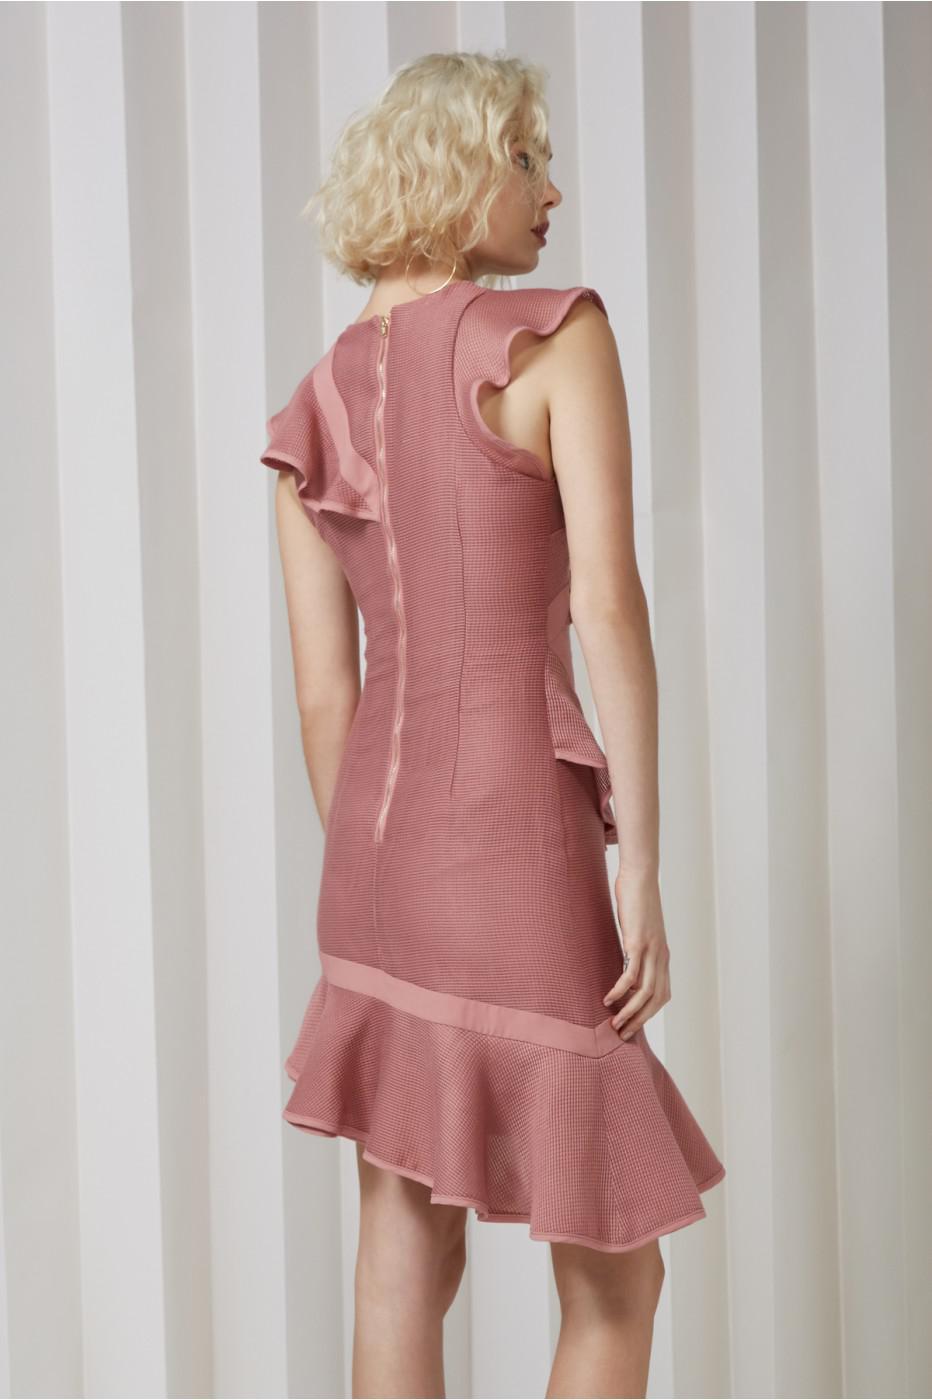 97e9e614e341 Keepsake Flashing Lights Mini Dress in Pink - Lyst